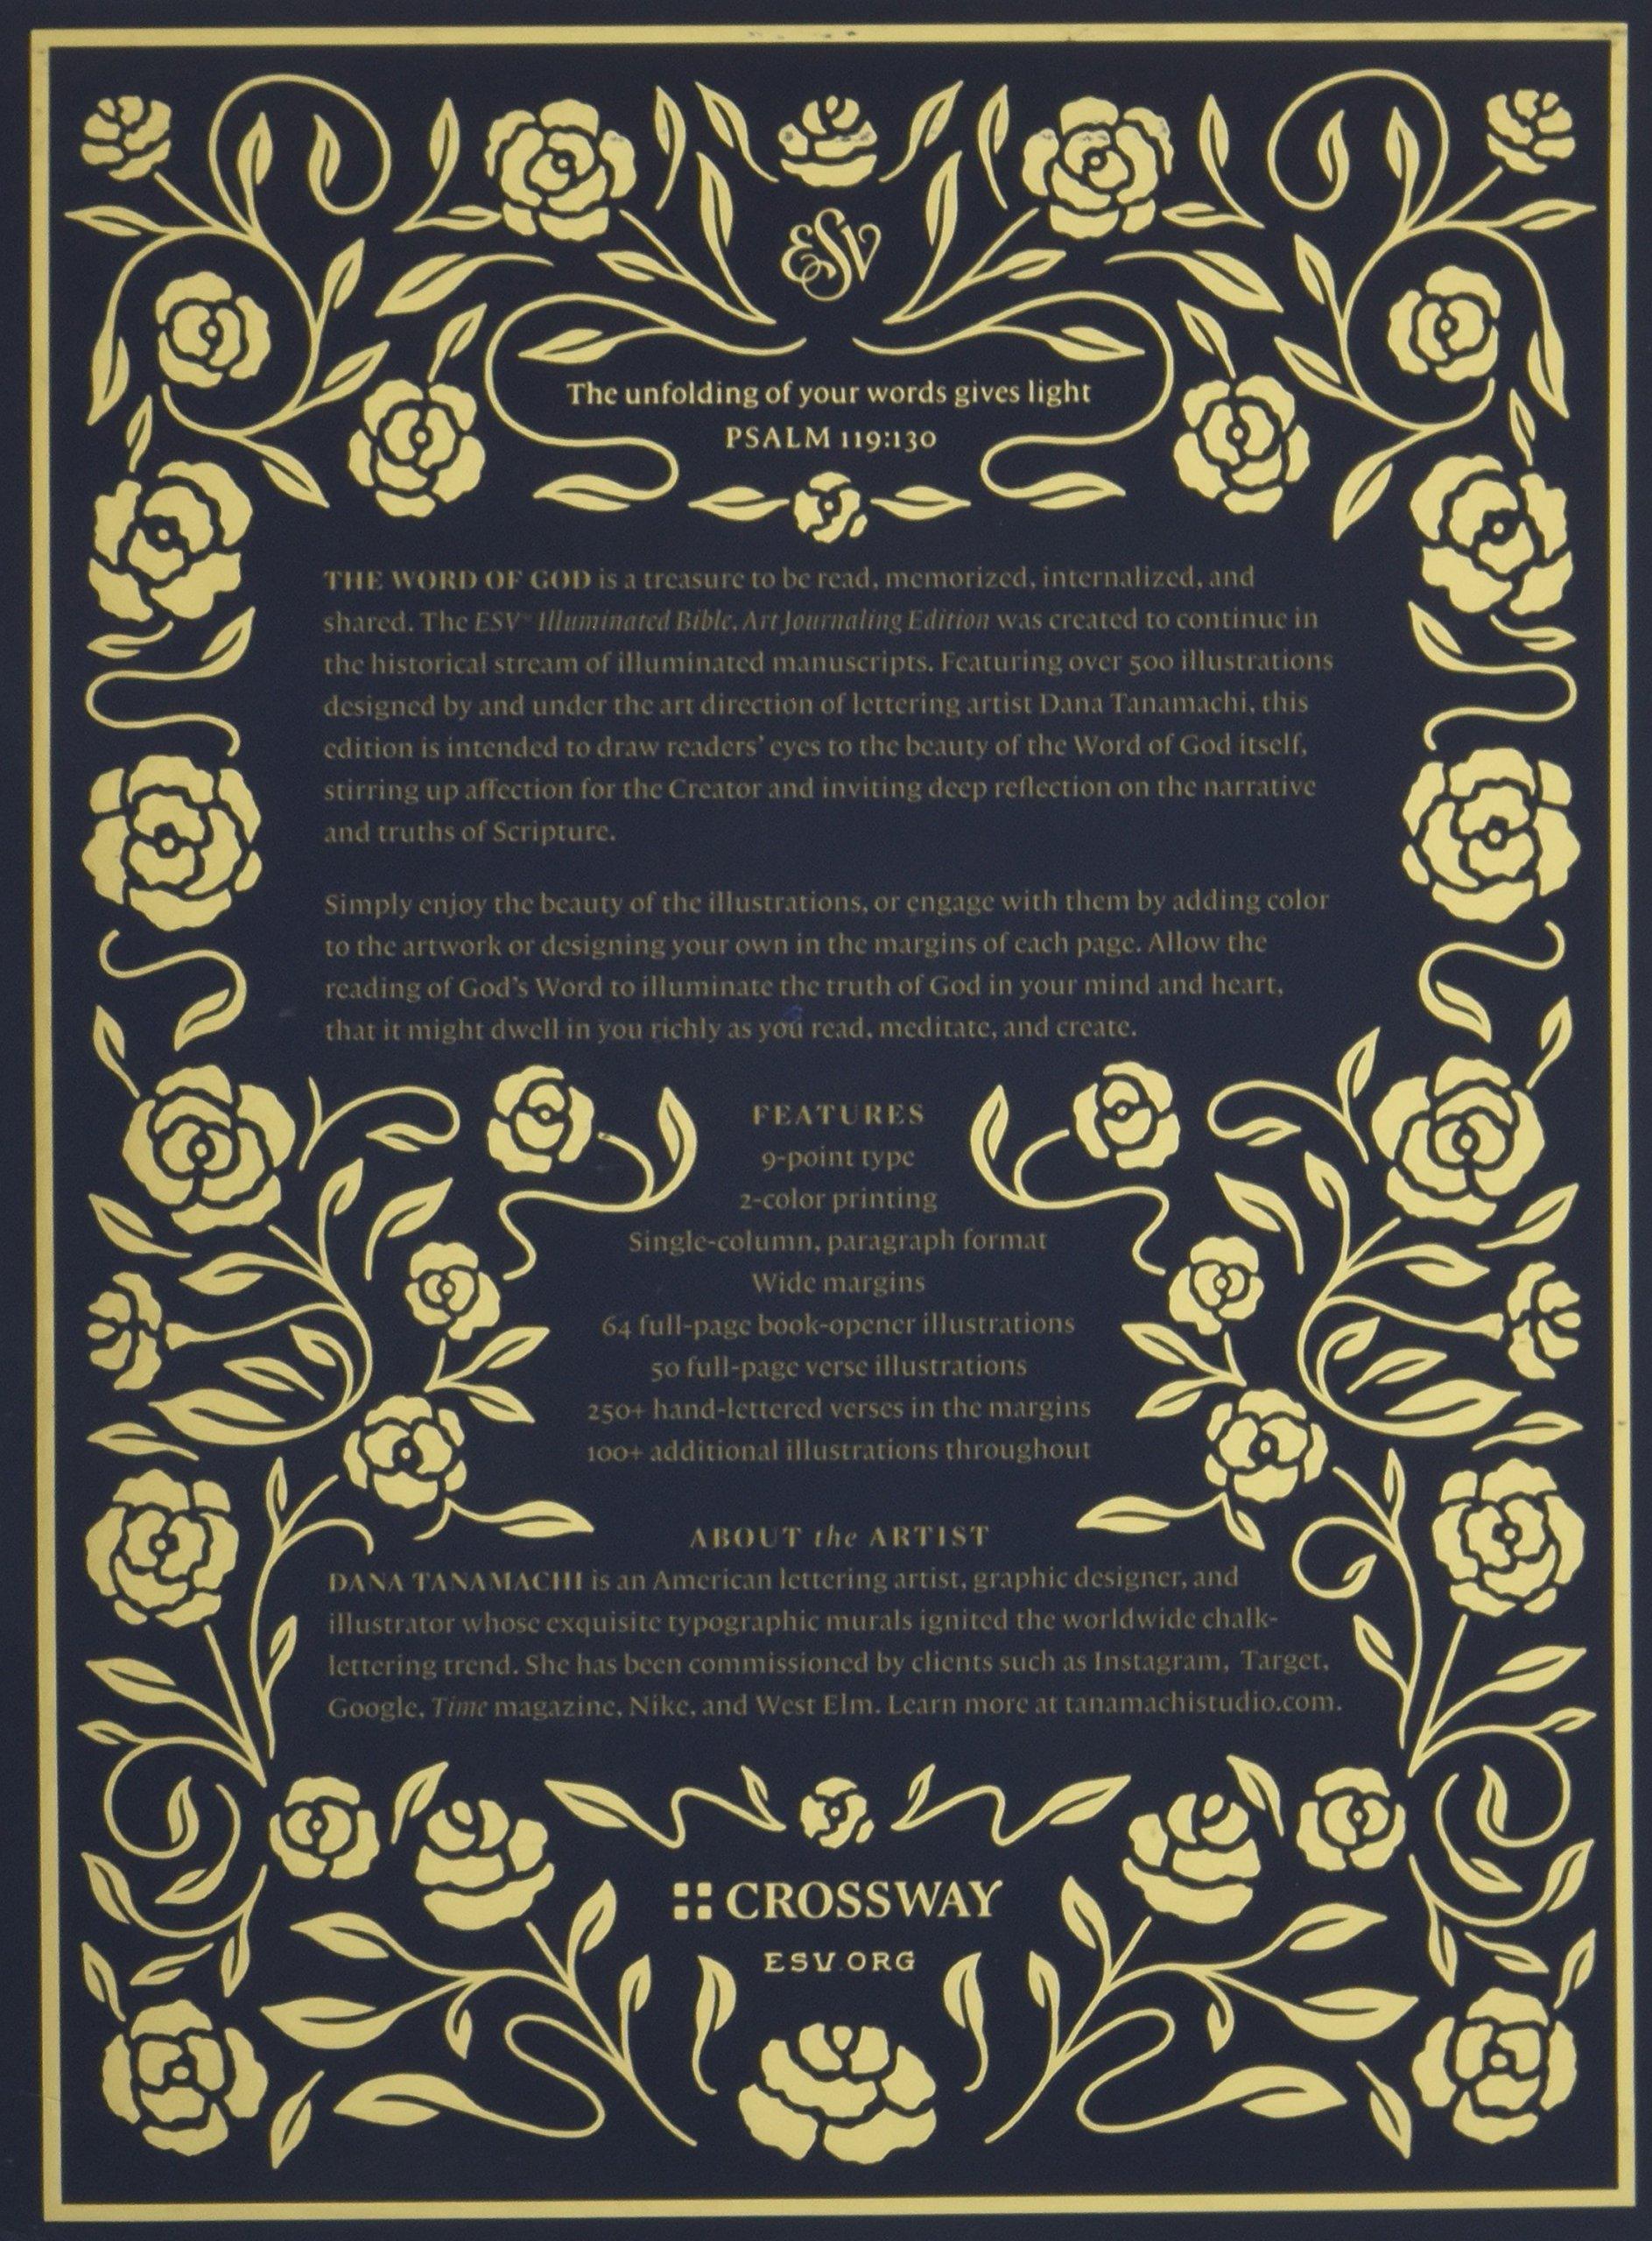 Esv Illuminated Bible Art Journaling Edition Cloth Over Board